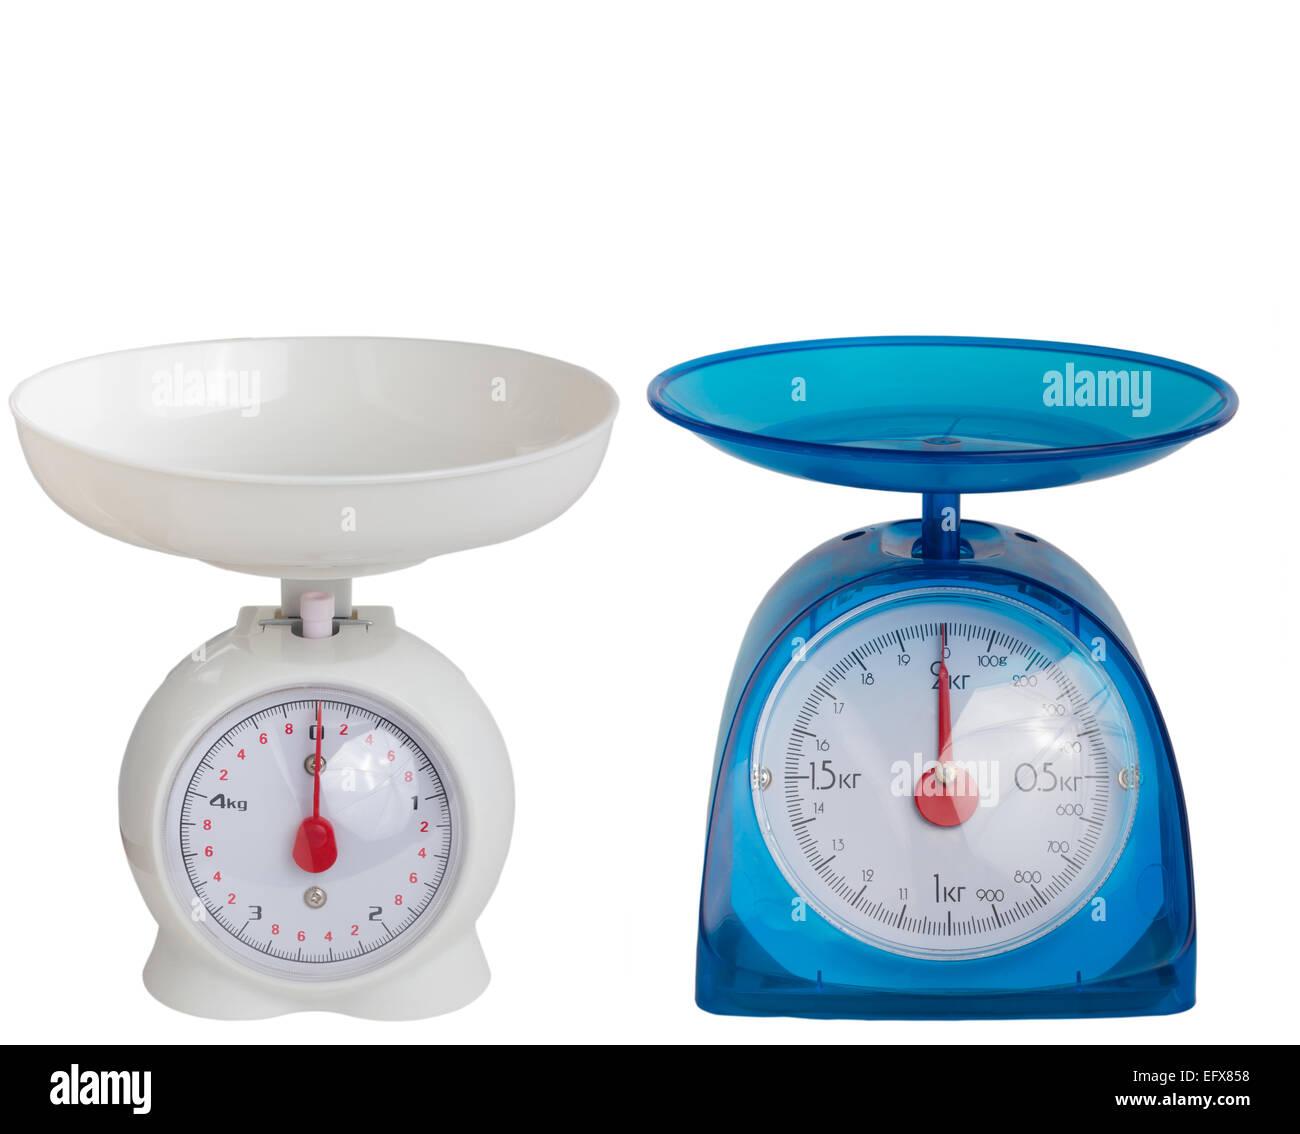 Retro Kitchen Weight Scale On Stock Photos & Retro Kitchen Weight ...